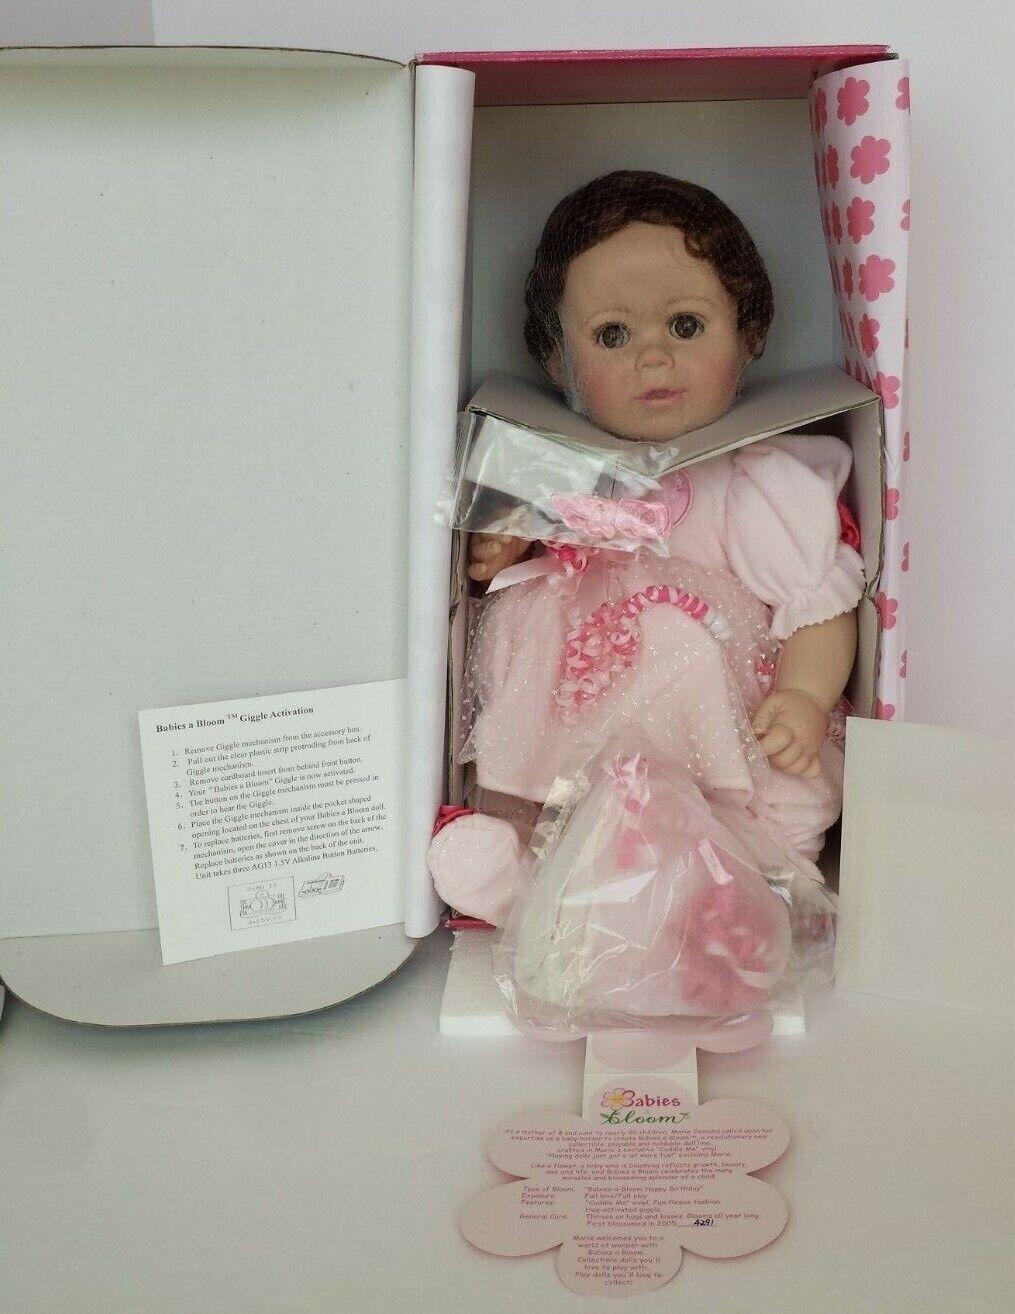 NEW NRFB COA  4291 MARIE OSMOND BABIES A BLOOM HAPPY BIRTHDAY VINYL DOLL